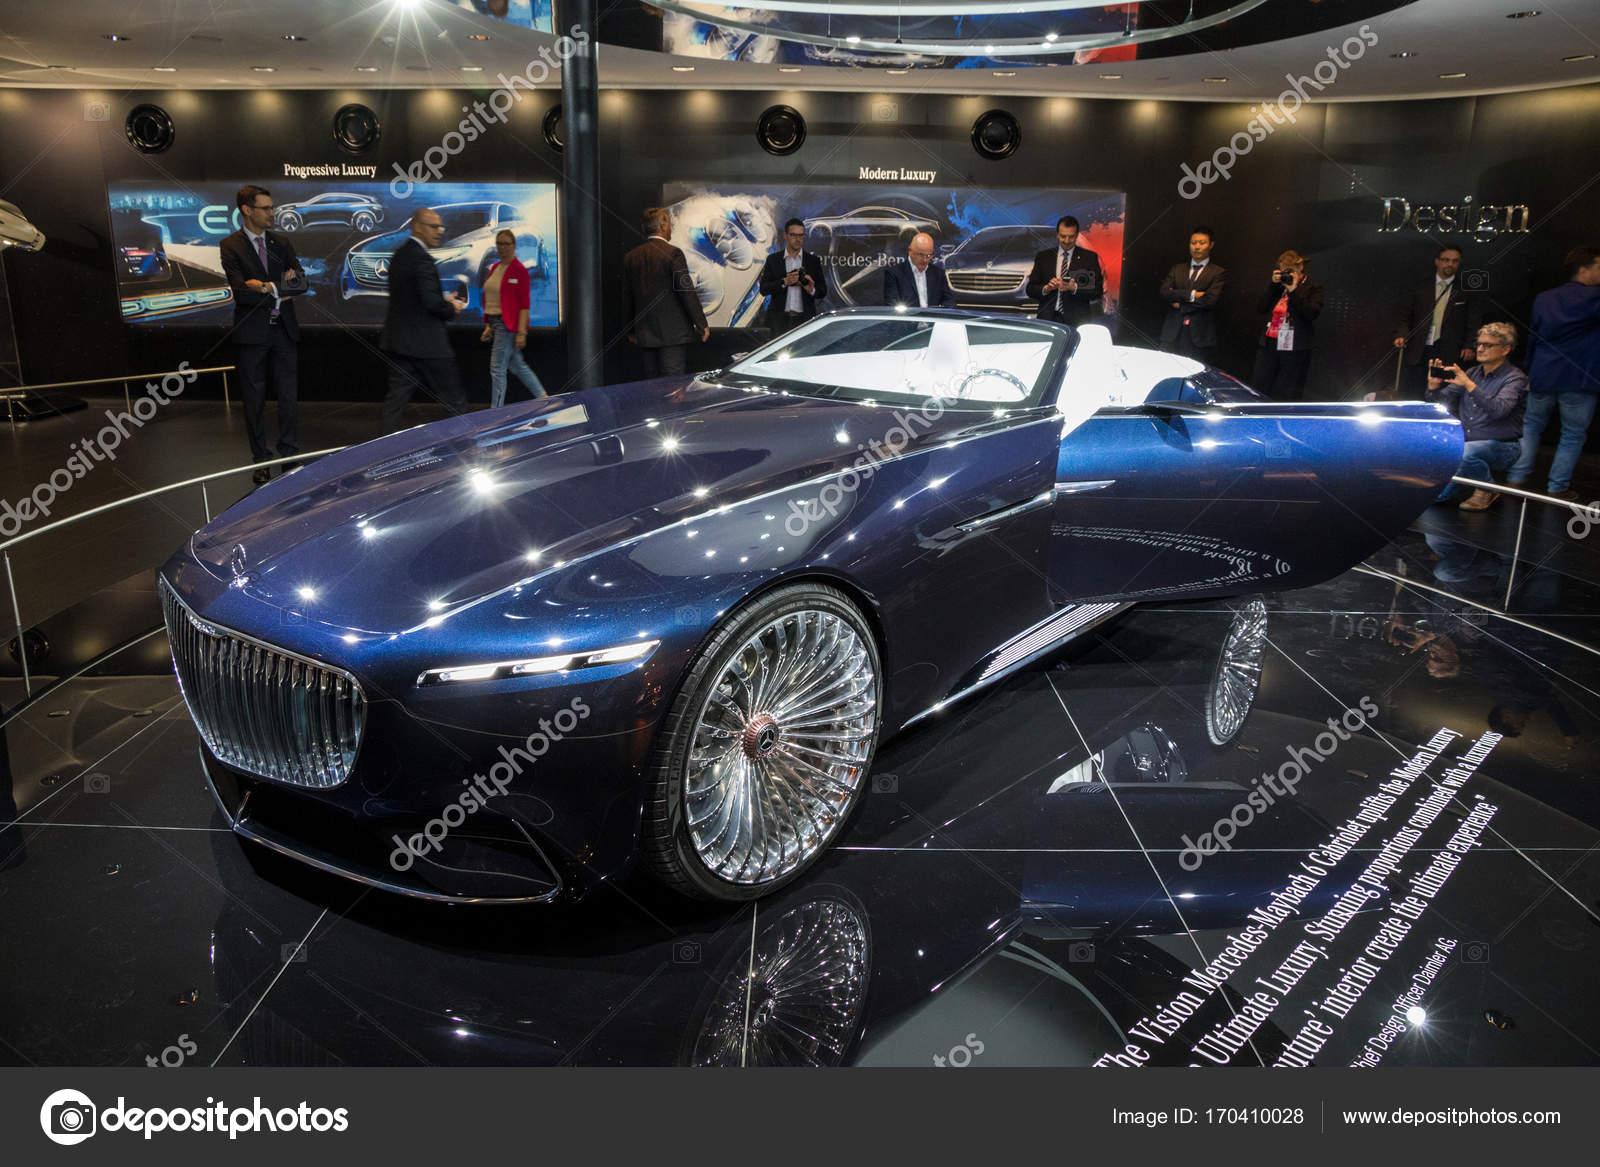 vision mercedes-maybach 6 cabriolet — redaktionelles stockfoto